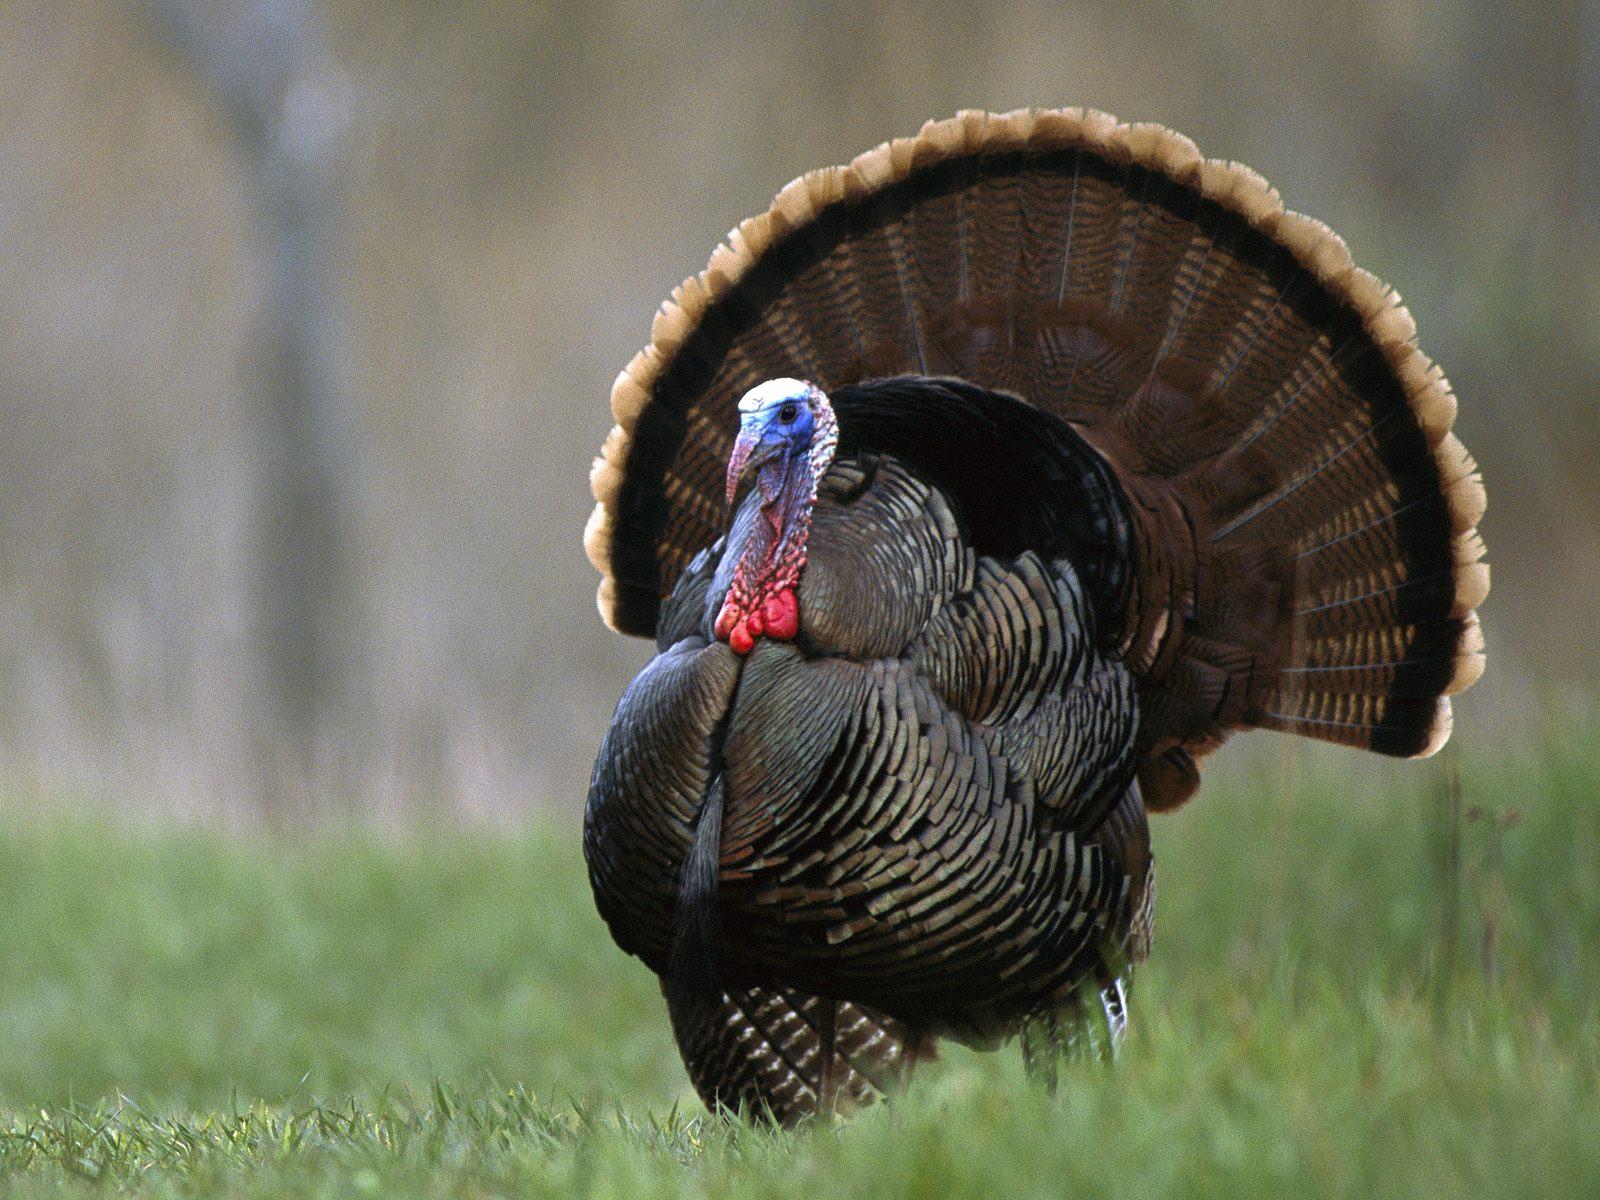 North American Wild Turkey